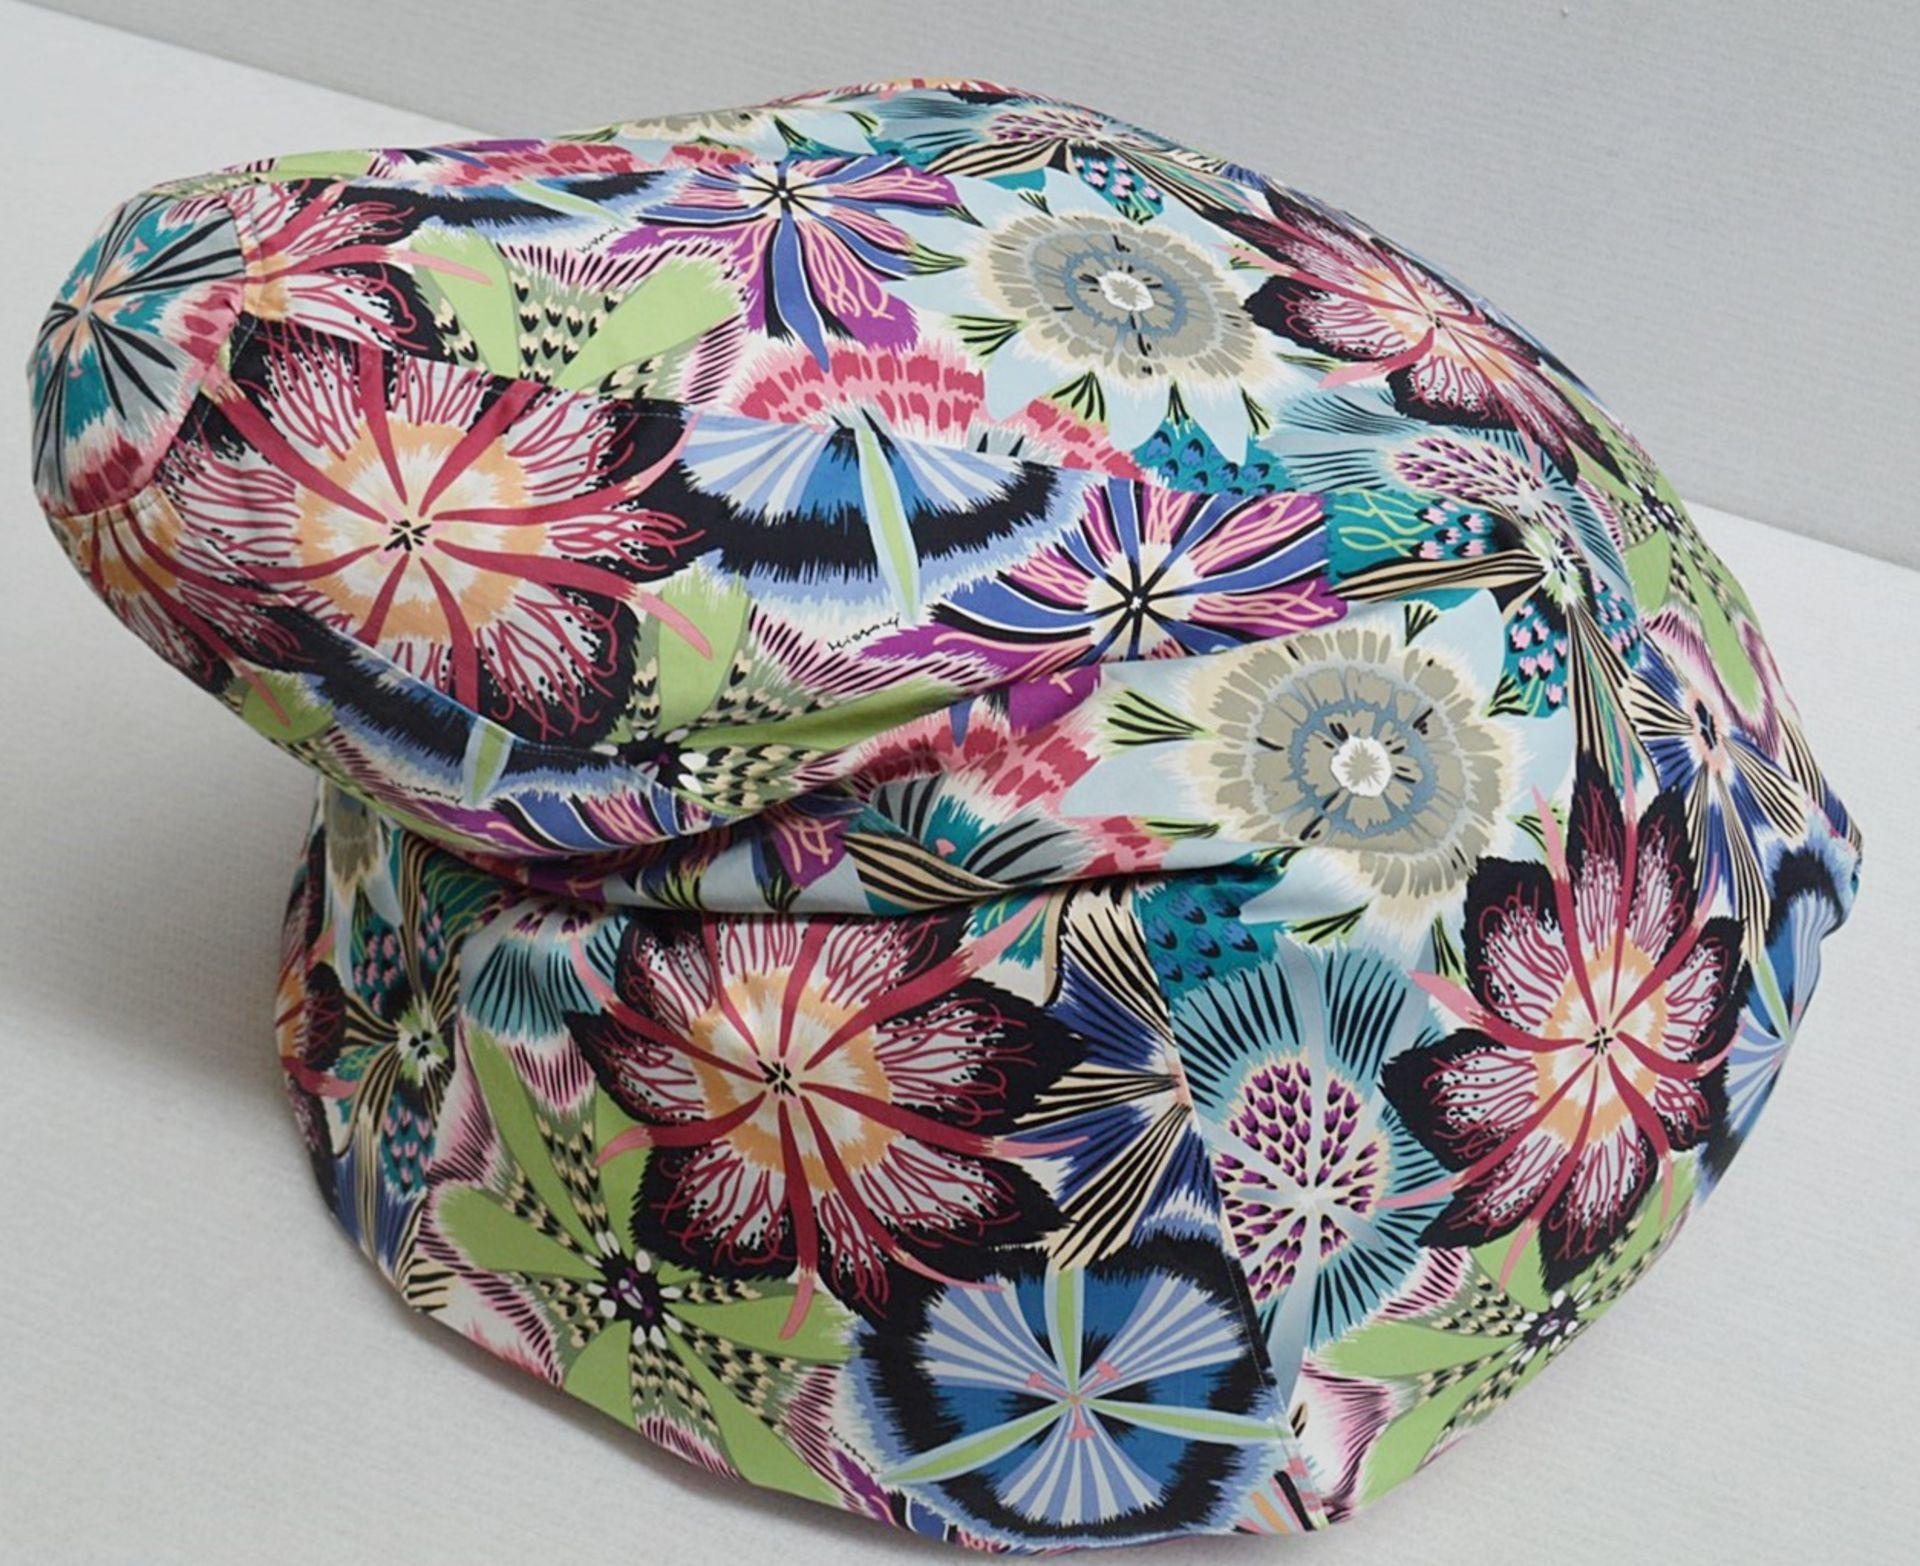 1 x Large Bean Bag Chair In 'Missoni Passiflora' Fabric - Dimensions Height 100 x Diameter 70cm - Image 2 of 5